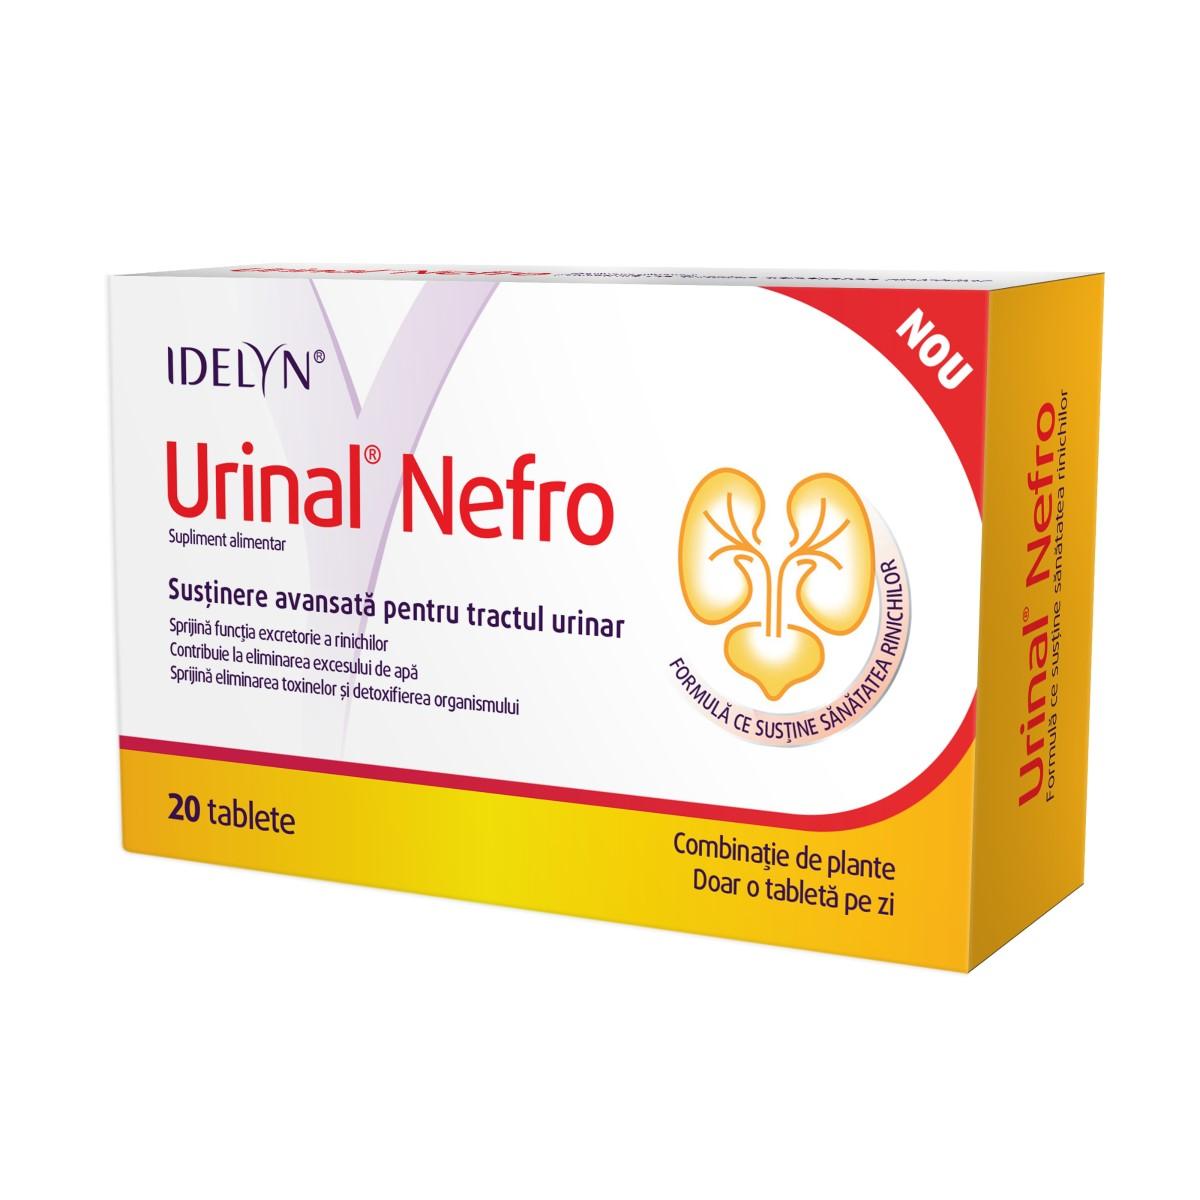 Urinal Nefro Idelyn, 20 tablete, Walmark drmax poza